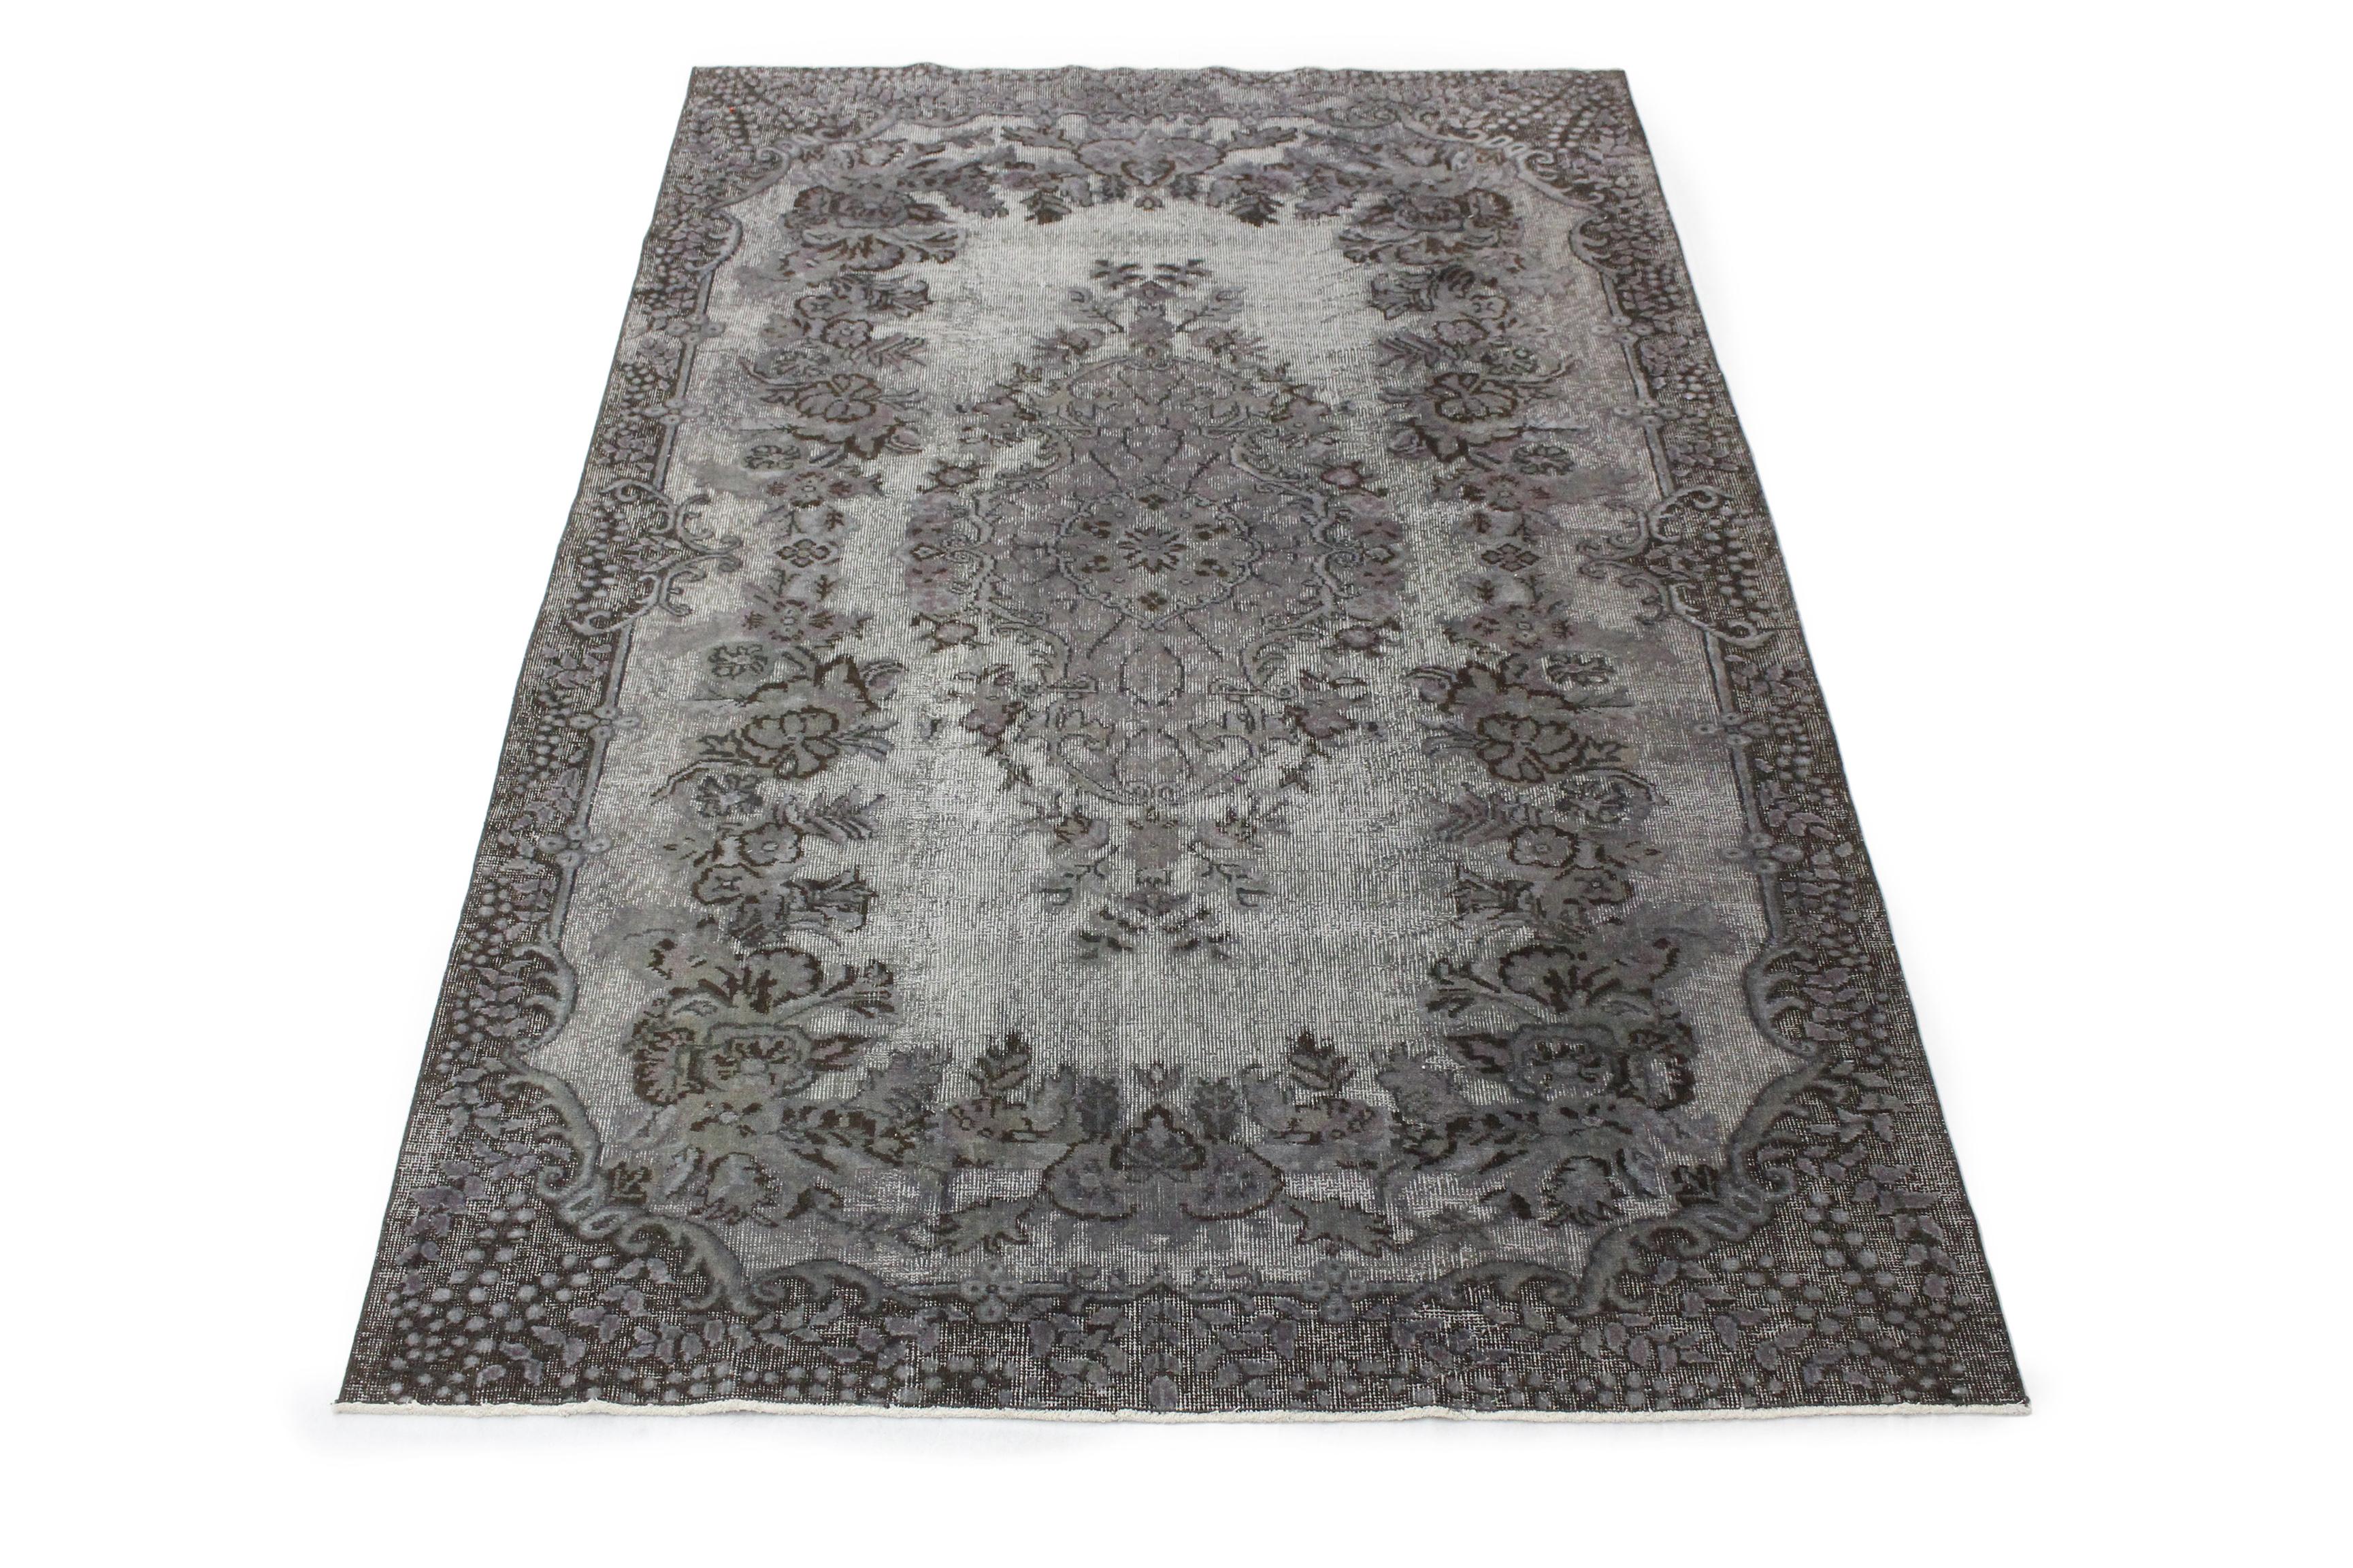 Orientteppich grau  Vintage-Teppiche - carpetido.de